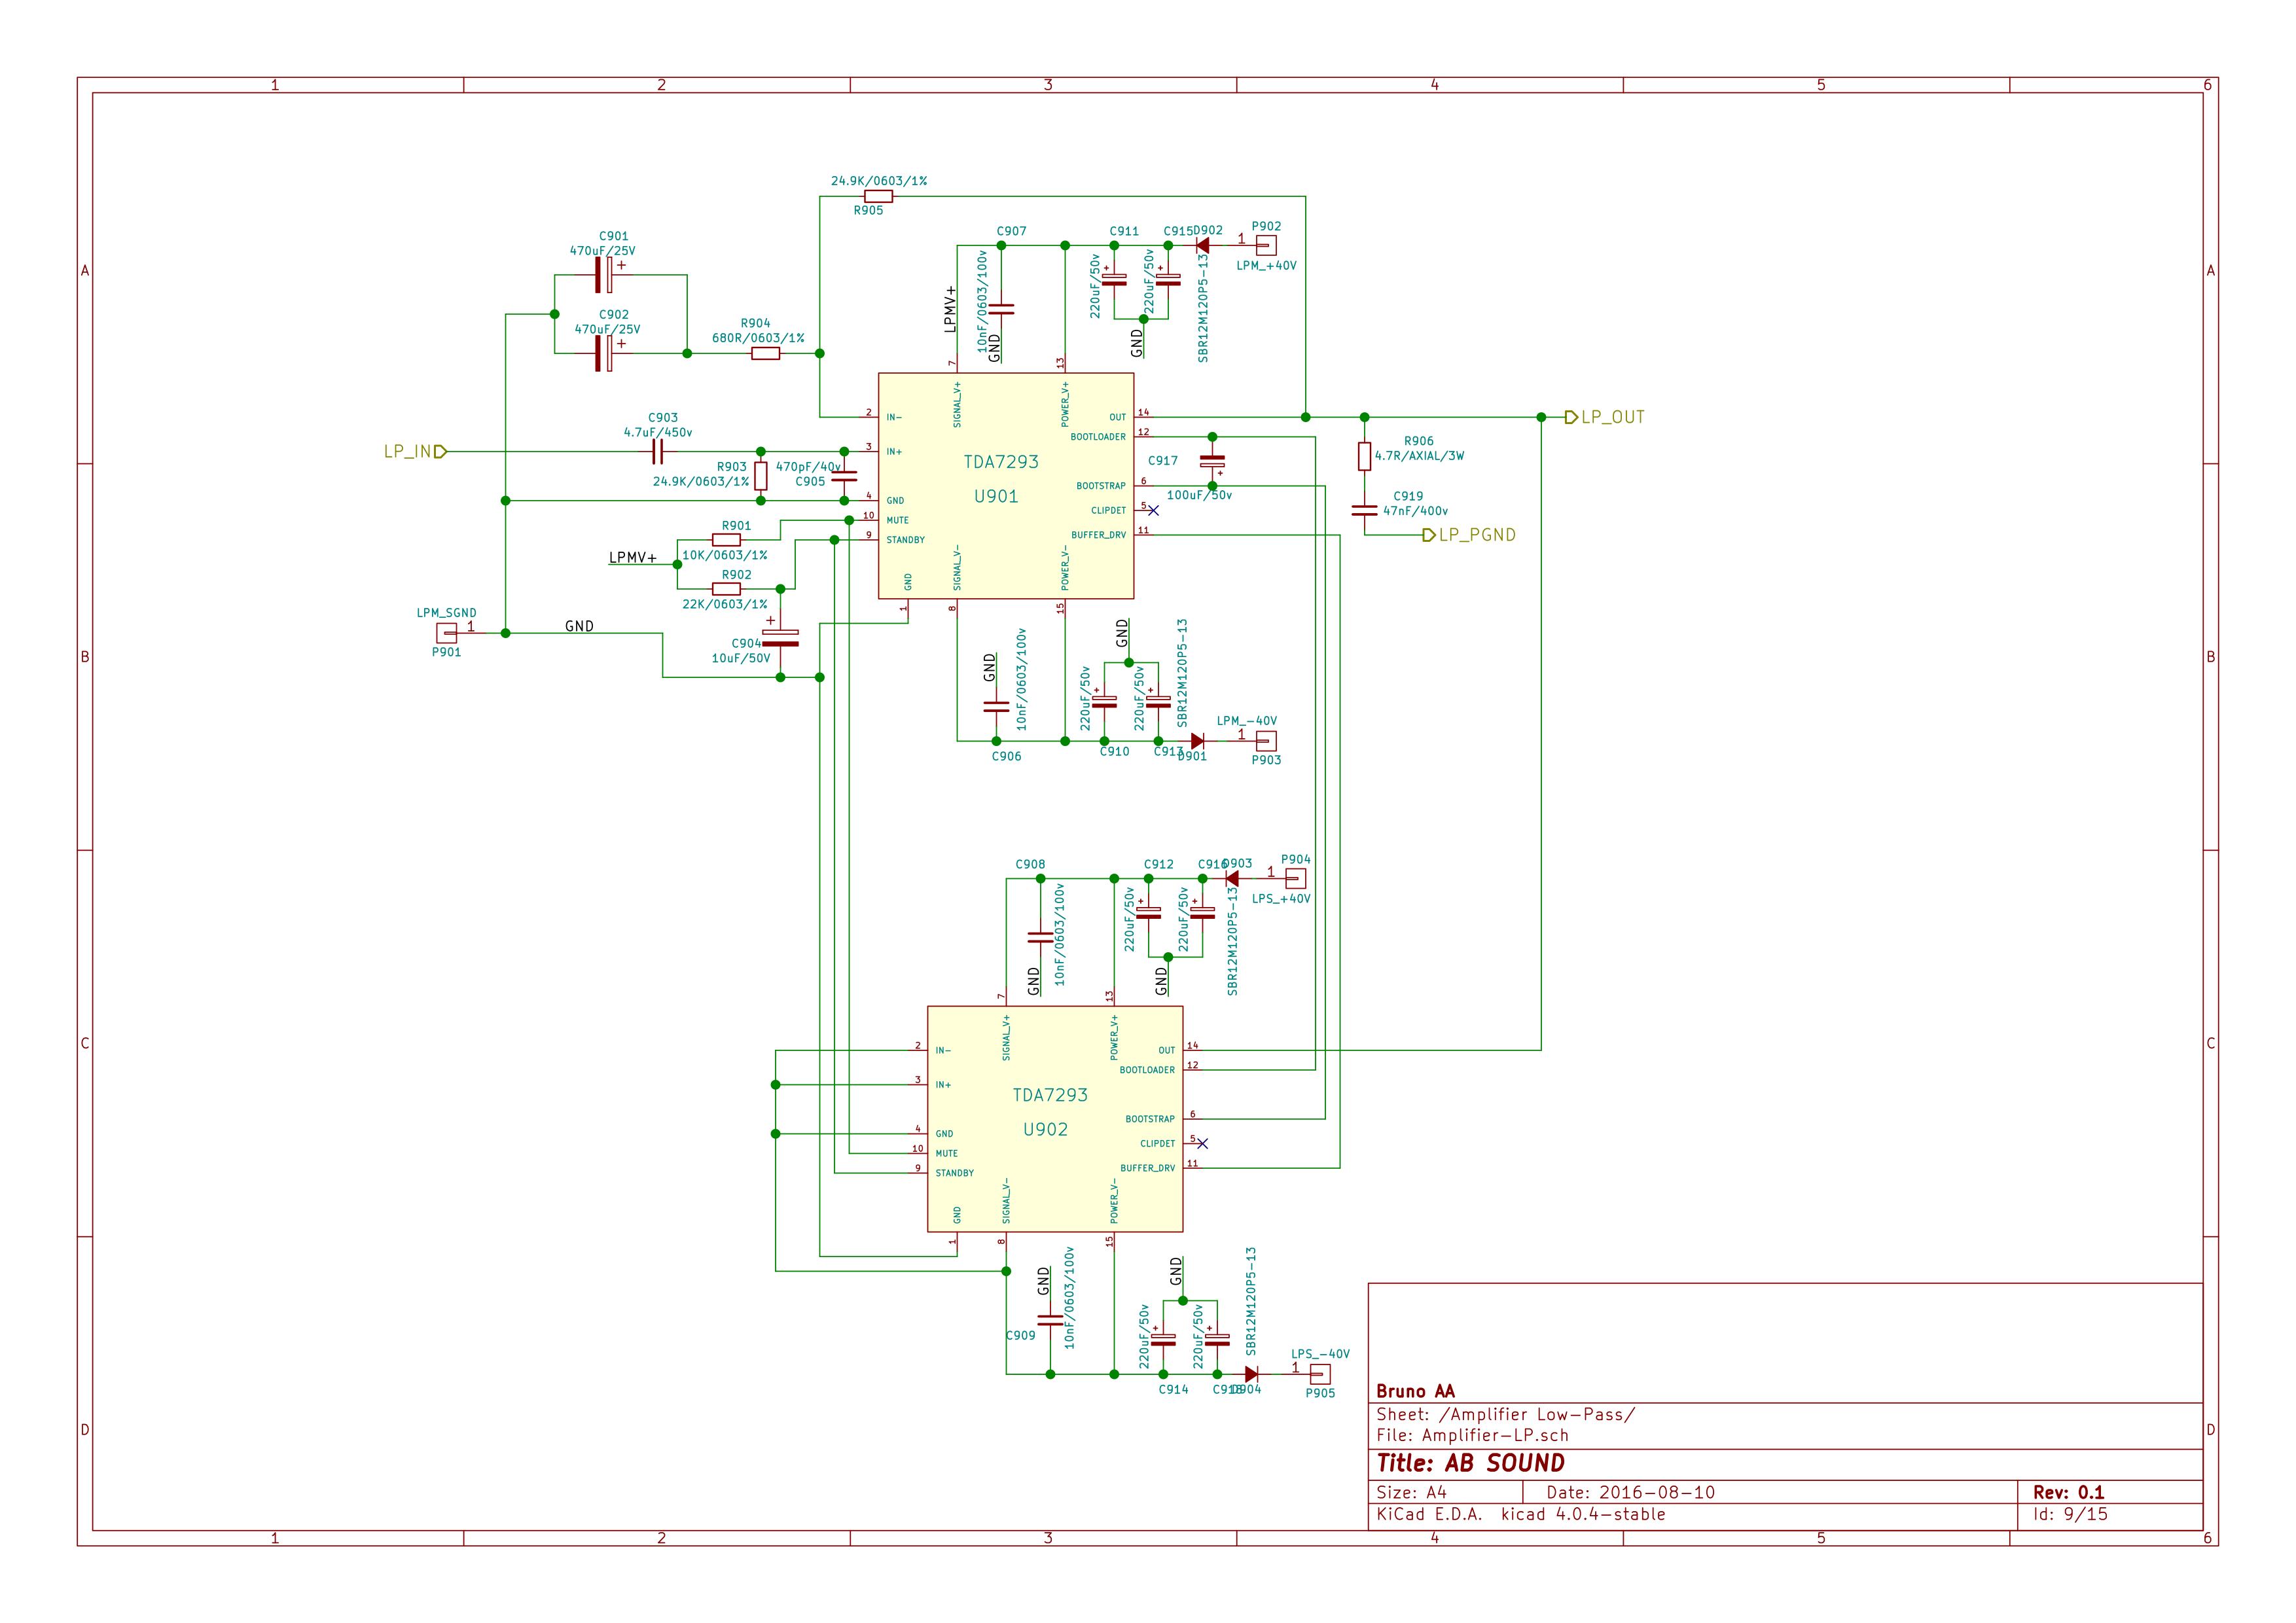 Logitech z 680 circuit diagram example electrical wiring diagram class ab sound system part i main board schematic bruno aa rh brunoaa wordpress com logitech z 680 5 1 computer speakers logitech z 680 craigslist swarovskicordoba Gallery